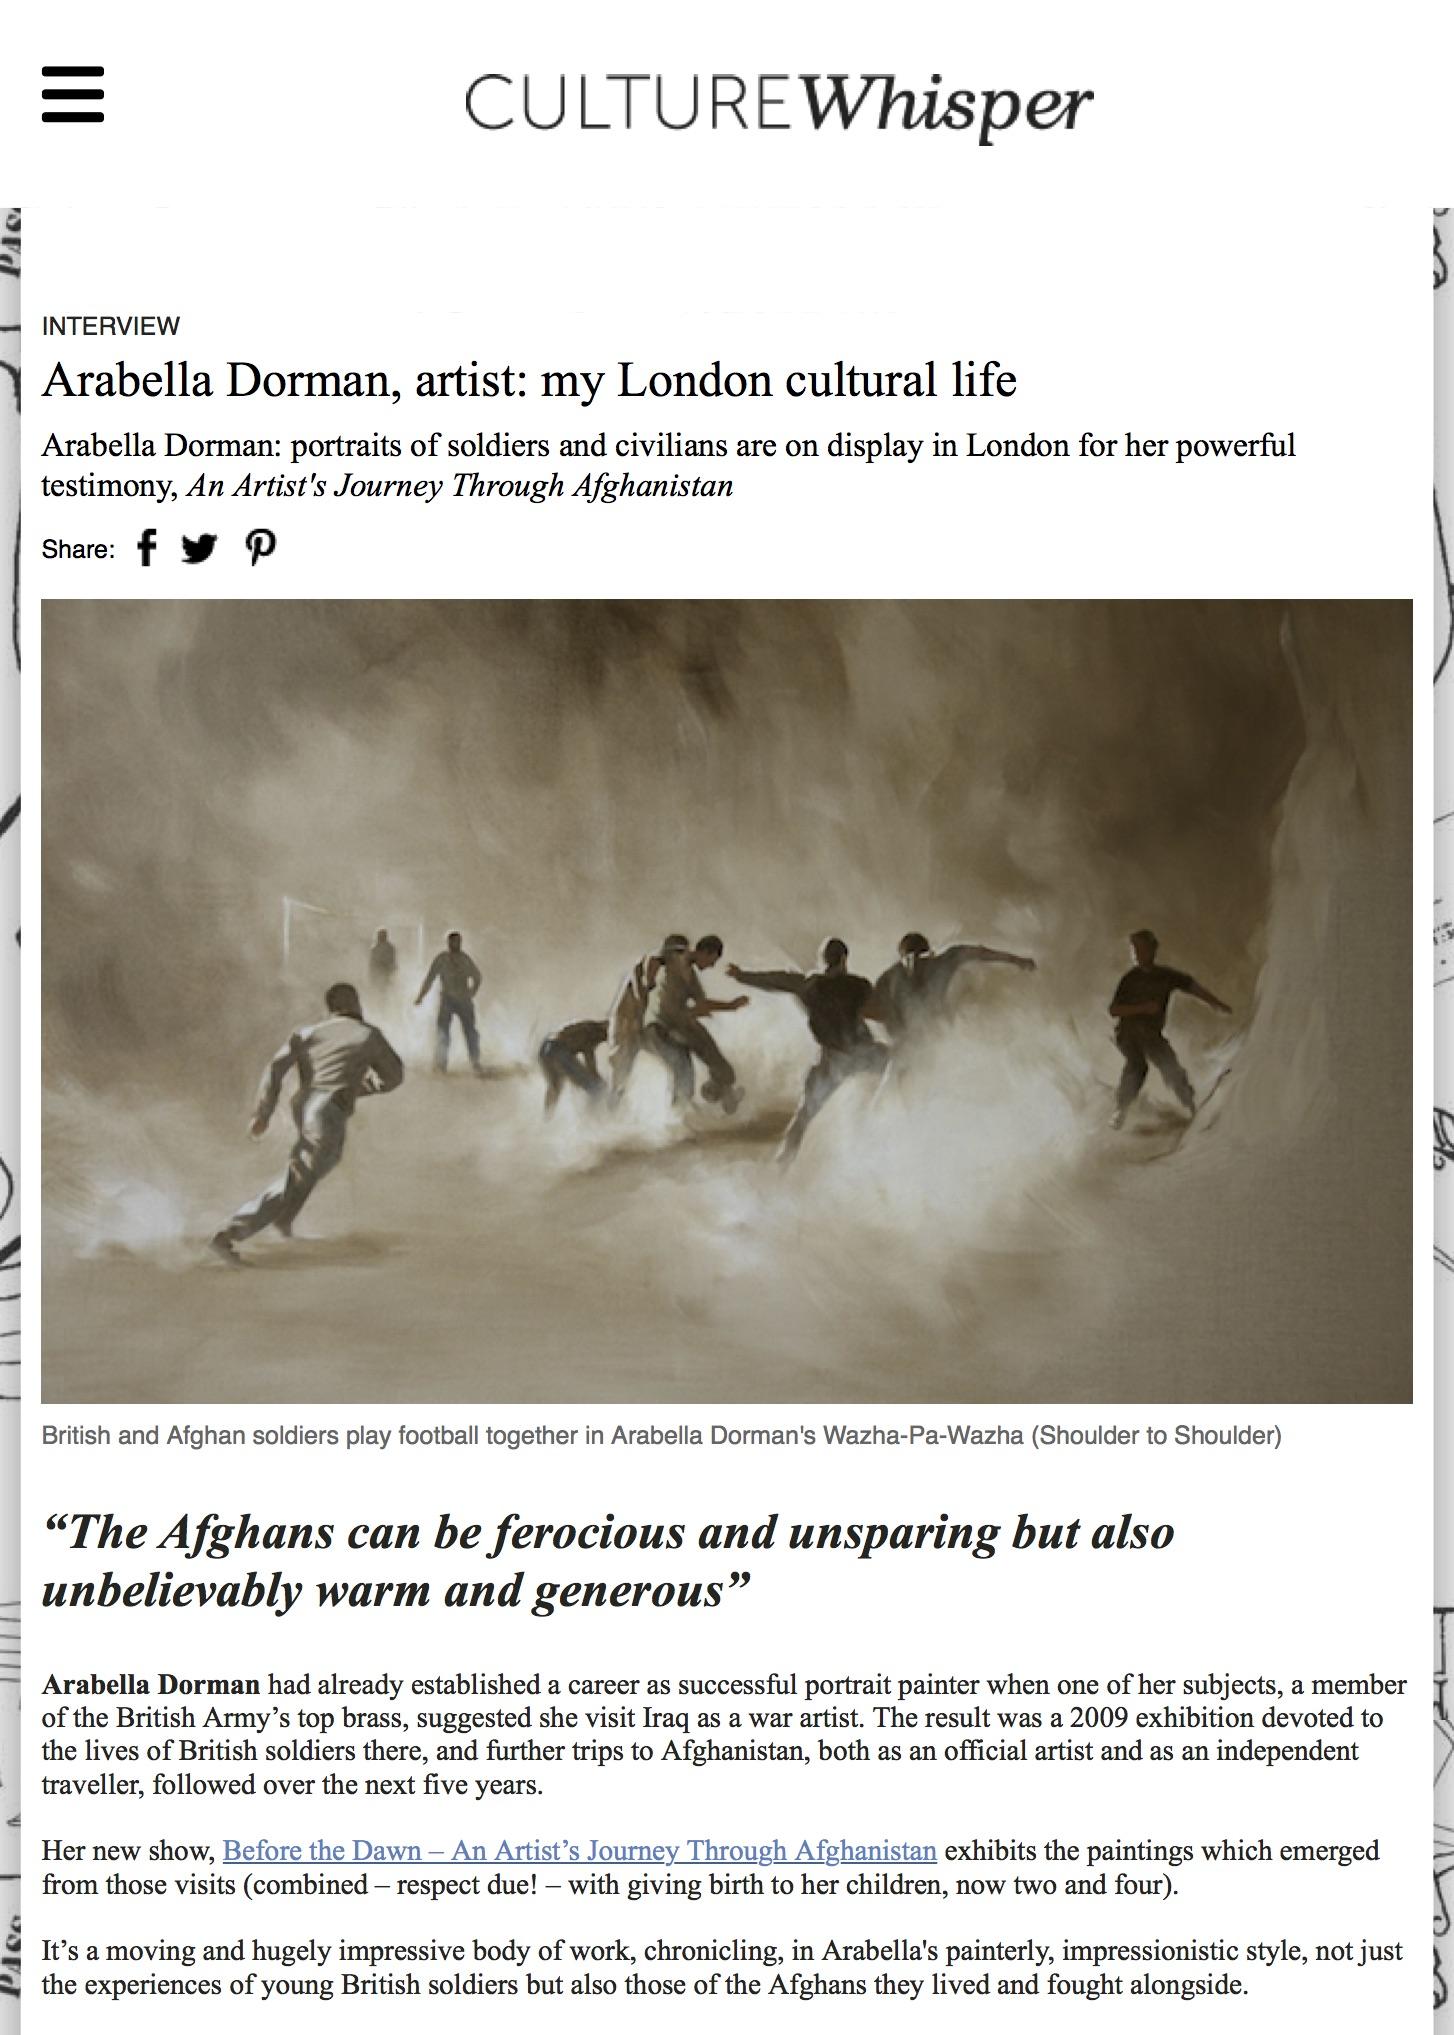 Arabella Dorman, artist: my London cultural life | Culture Whisper.jpg